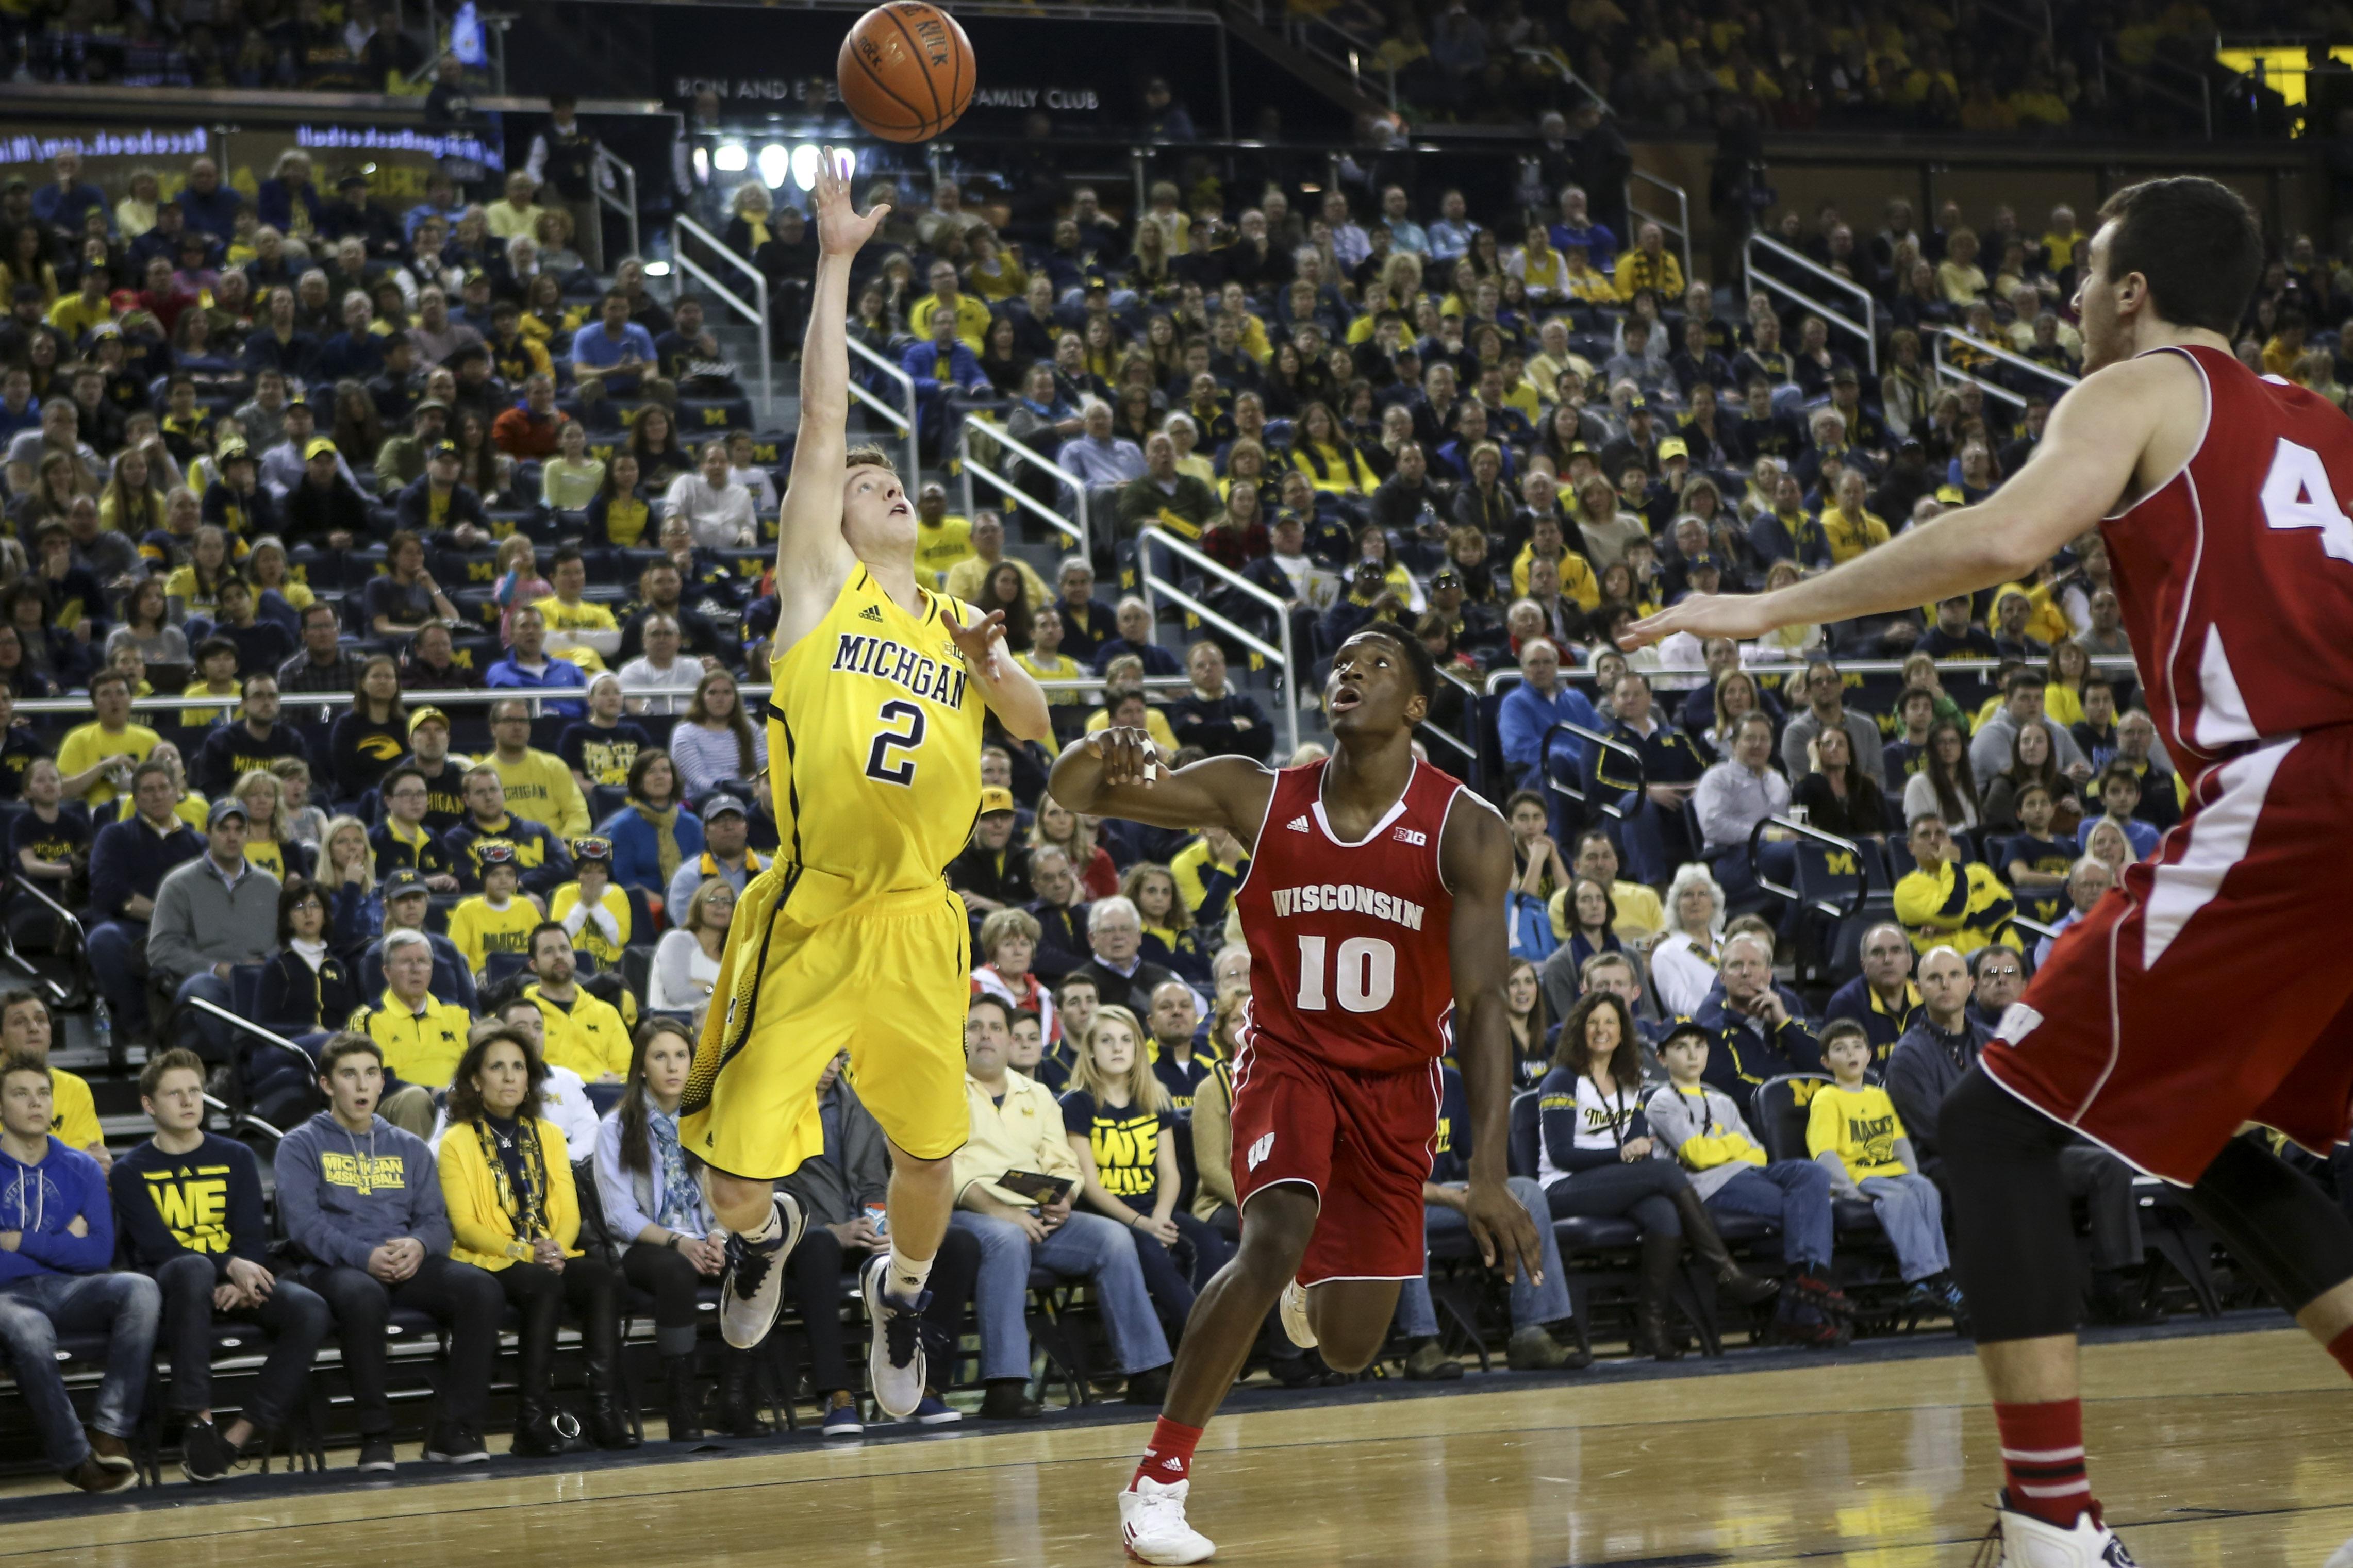 Wisconsin 69, Michigan 64 – #4